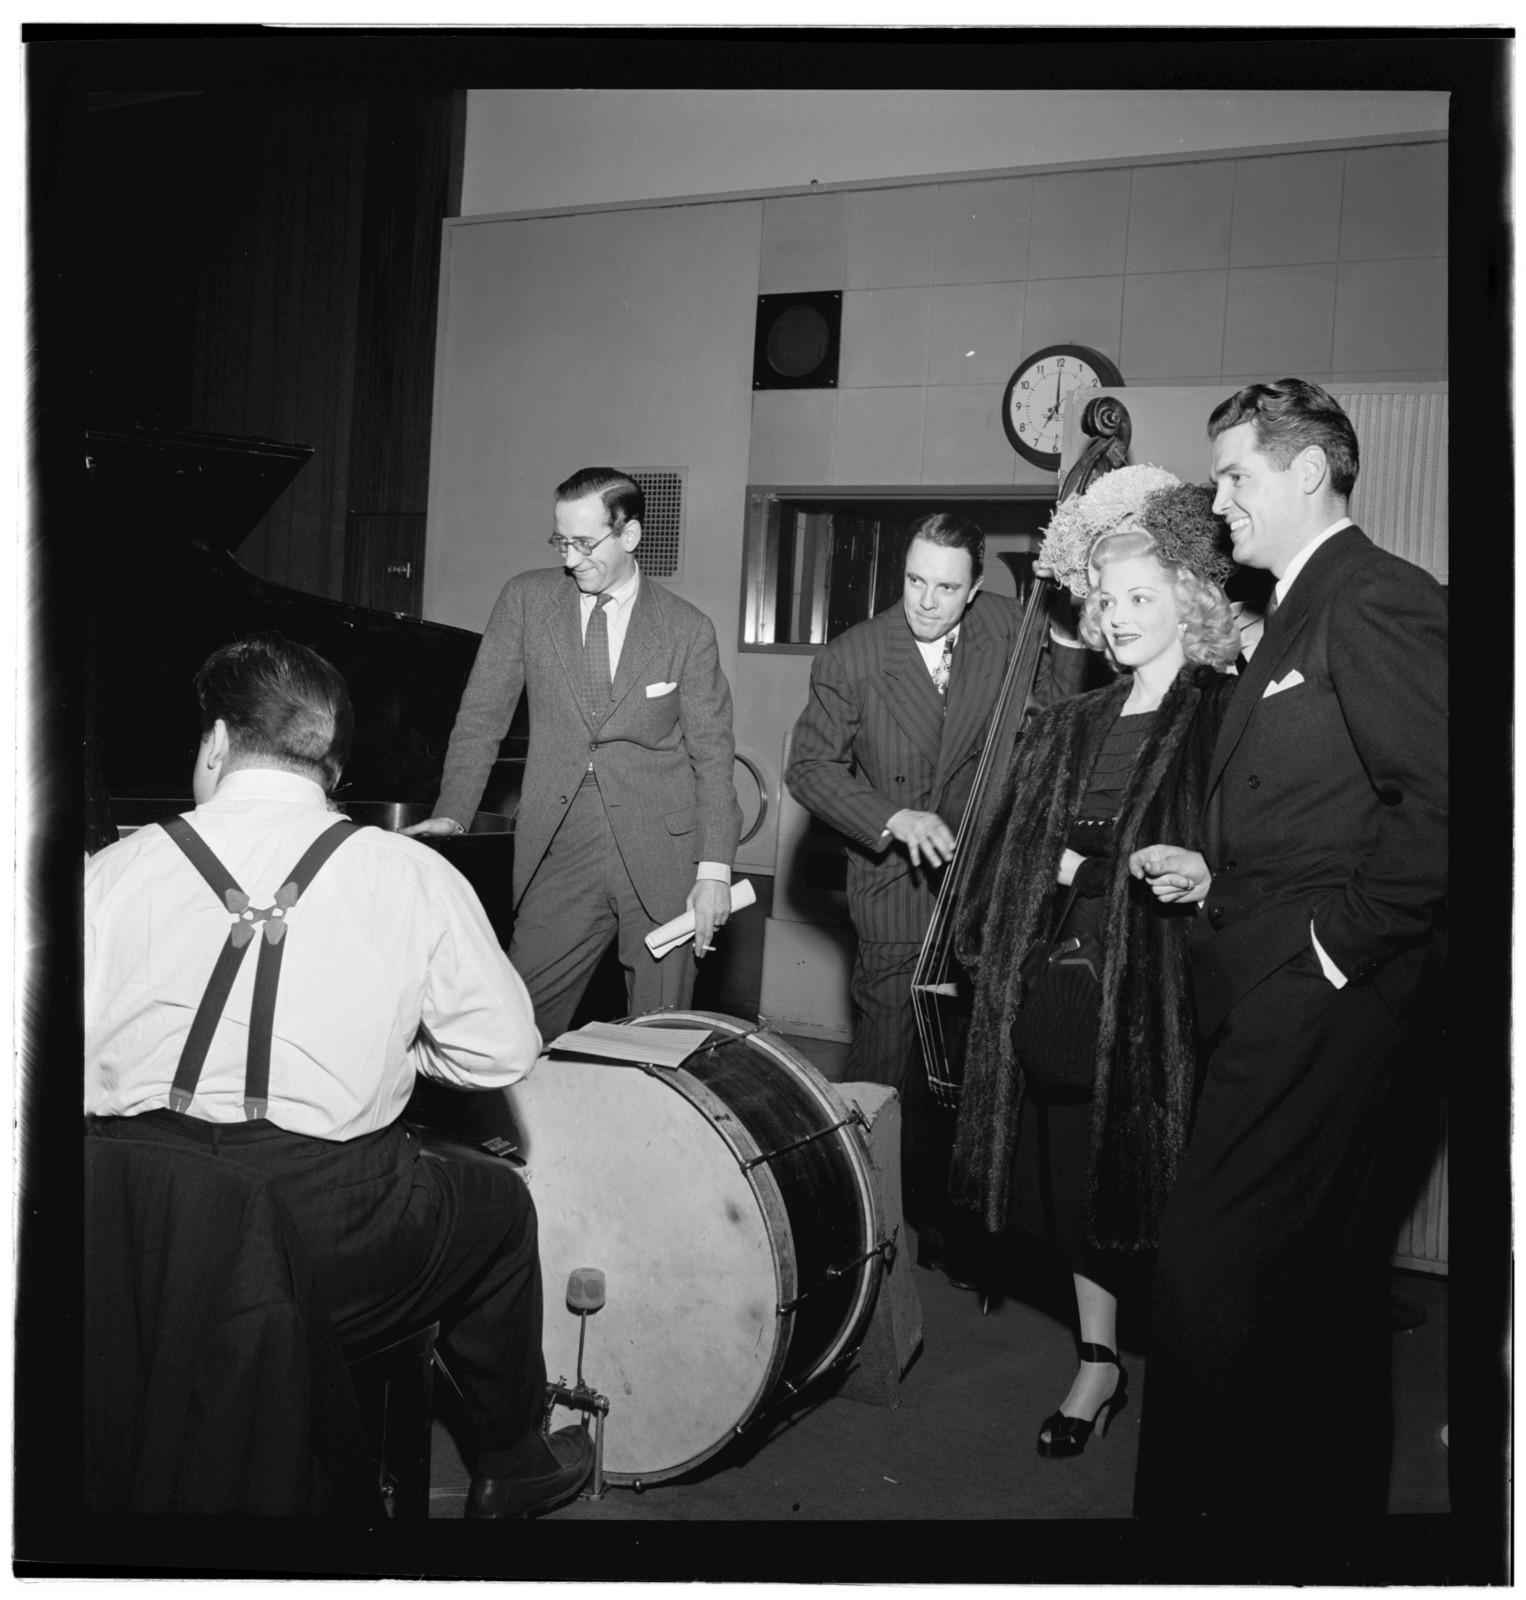 [Portrait of Bob Haggart, Marion Hutton, and Gordon MacRae, New York, N.Y., between 1946 and 1948]